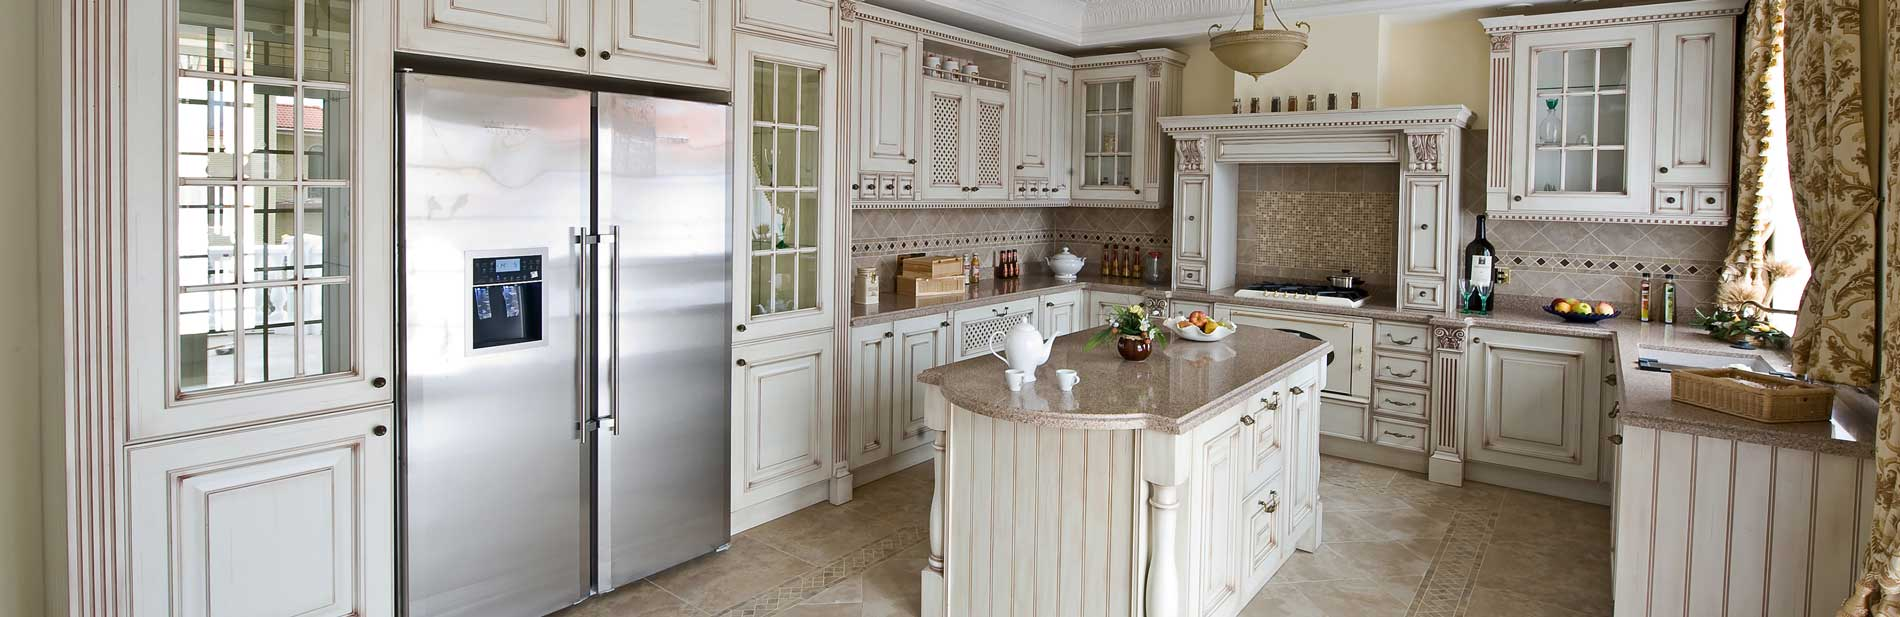 alabama kitchen remodeling montgomery al Alabama Remodeling